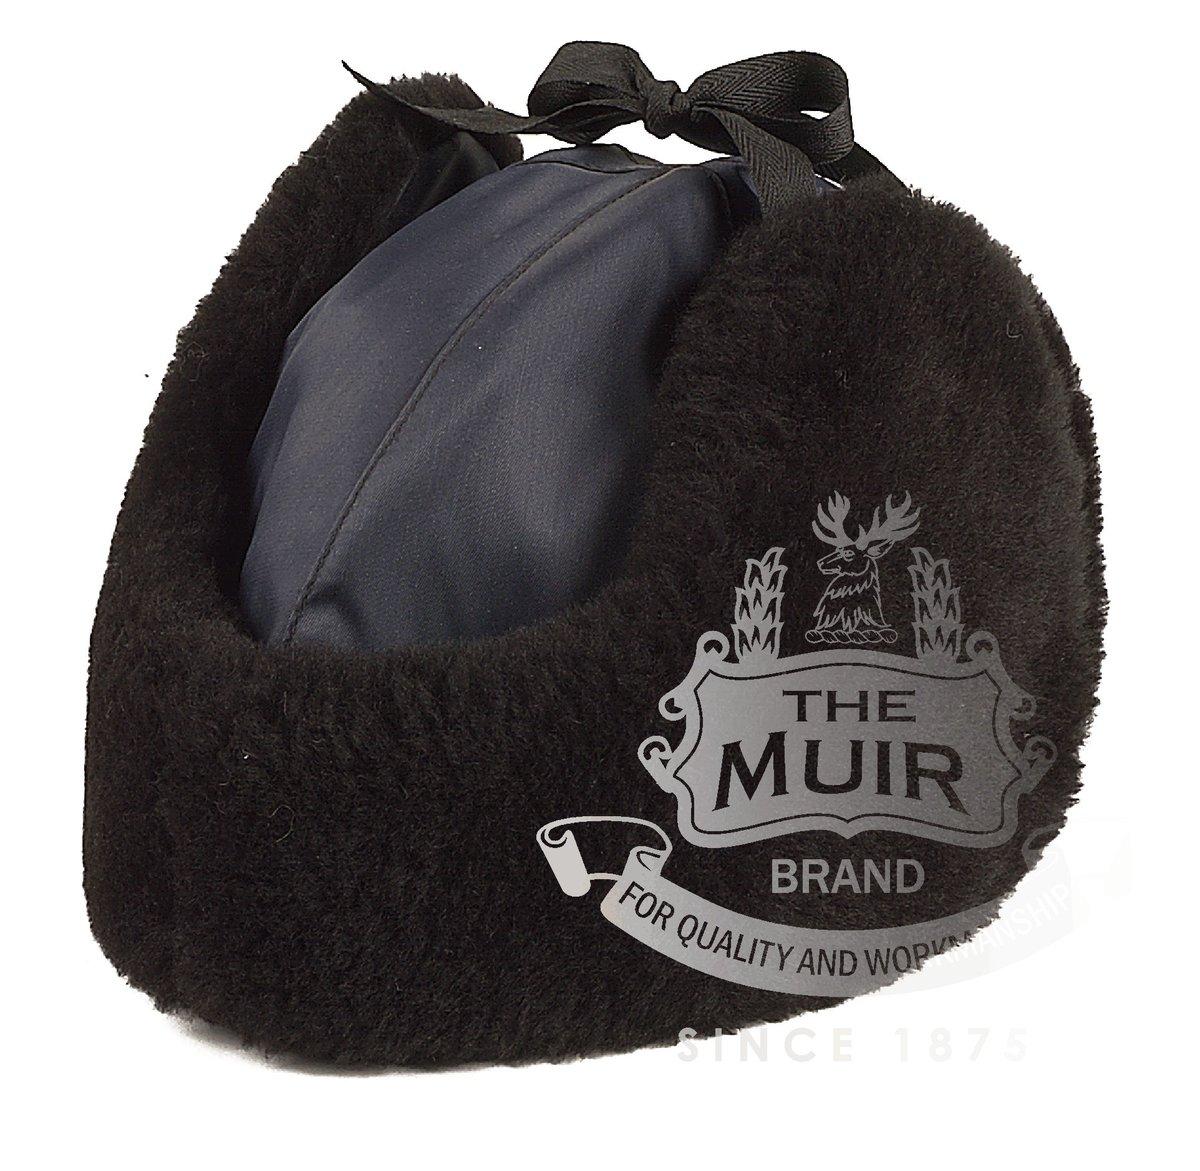 e01fad36af2aa 1200x1171 Muir Cap Amp Regalia Ltd. Muir Cap Amp Regalia Ltd.